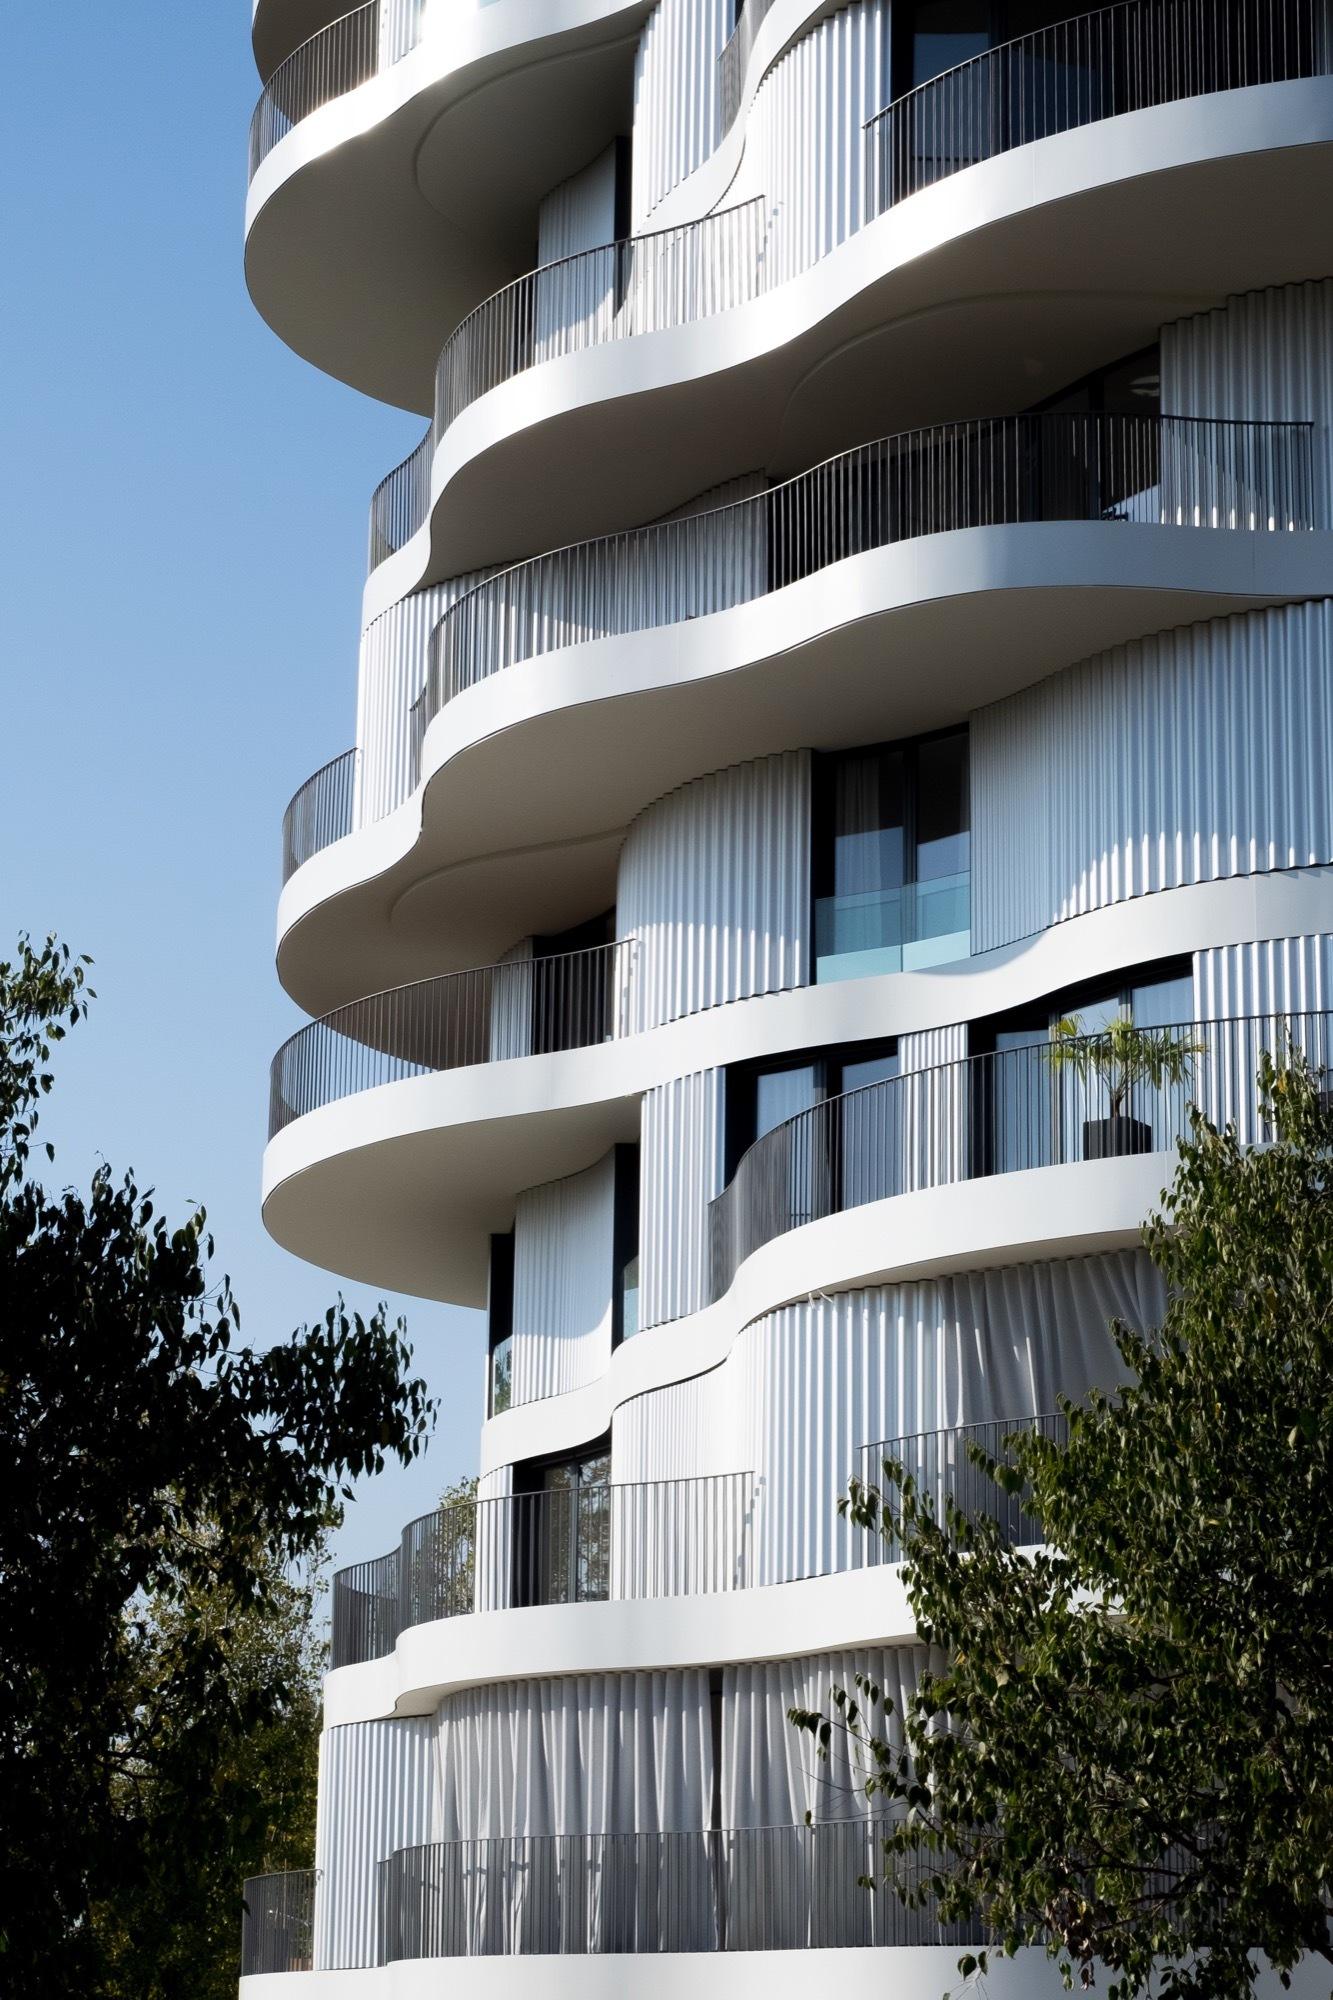 Folie Divine / Farshid Moussavi Architecture | ArchDaily